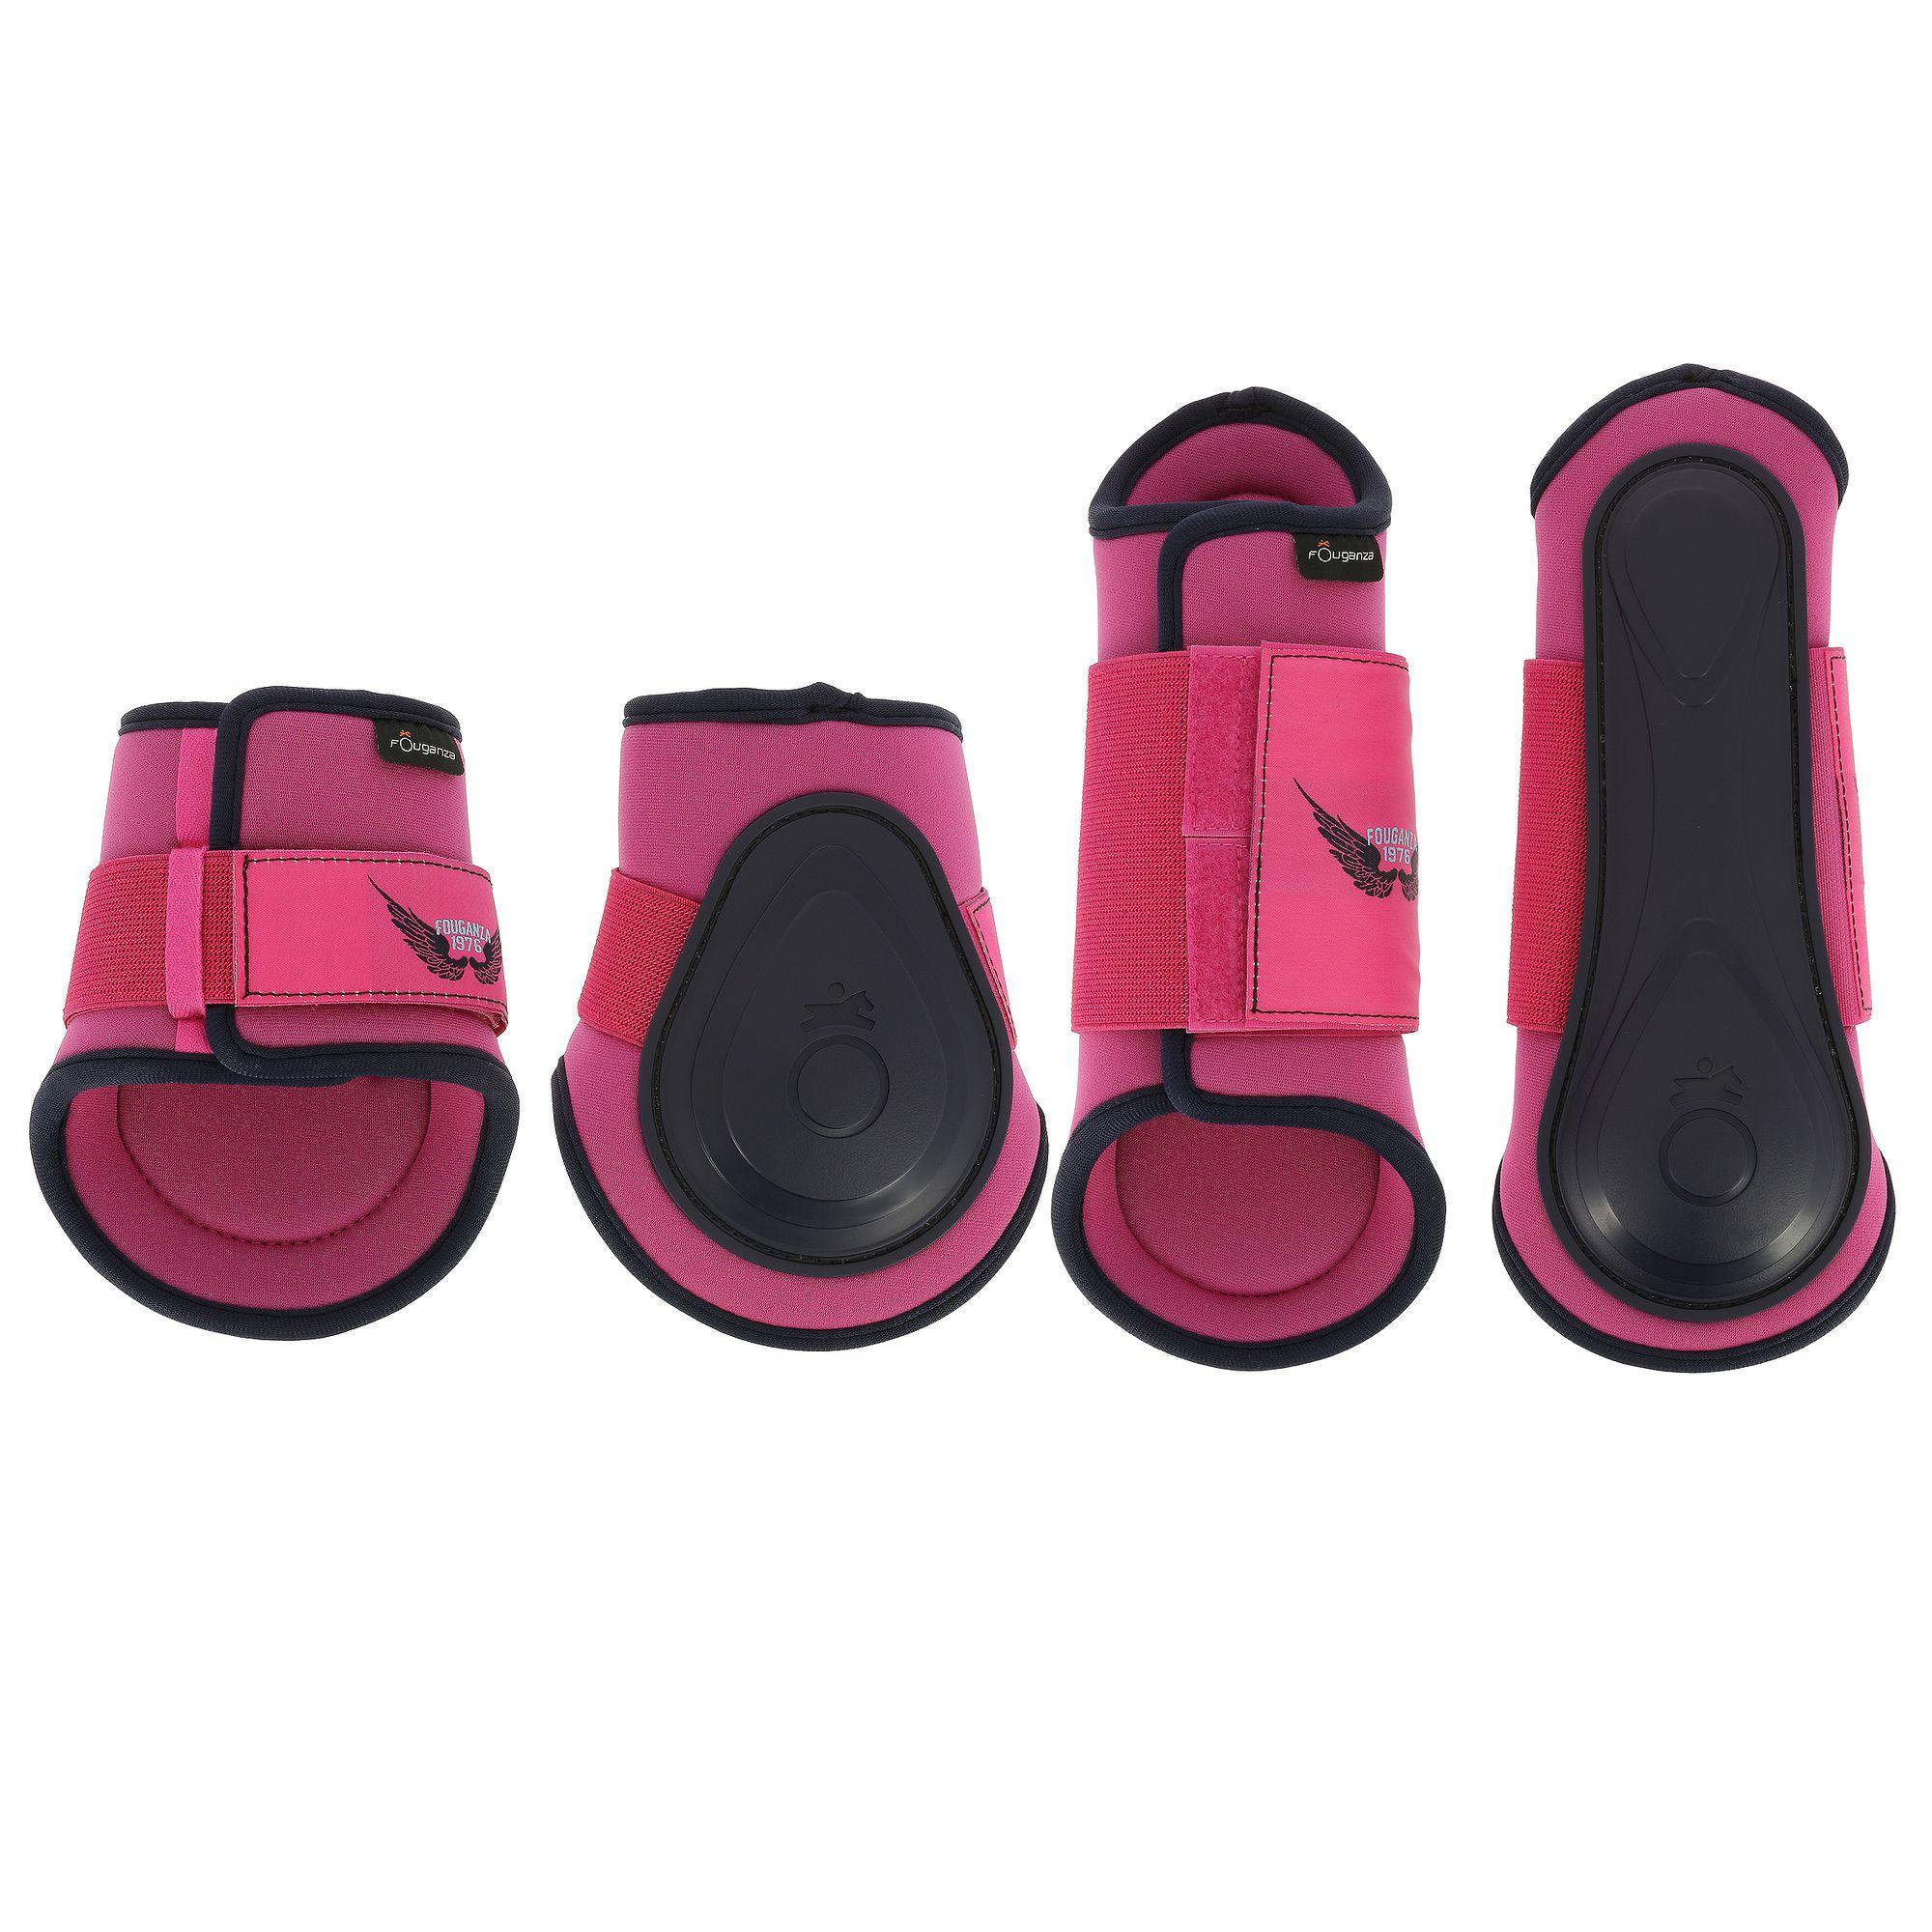 Fouganza Set van 2 pees- en 2 kogelbeschermers Soft ruitersport roze/marine - pony/paard